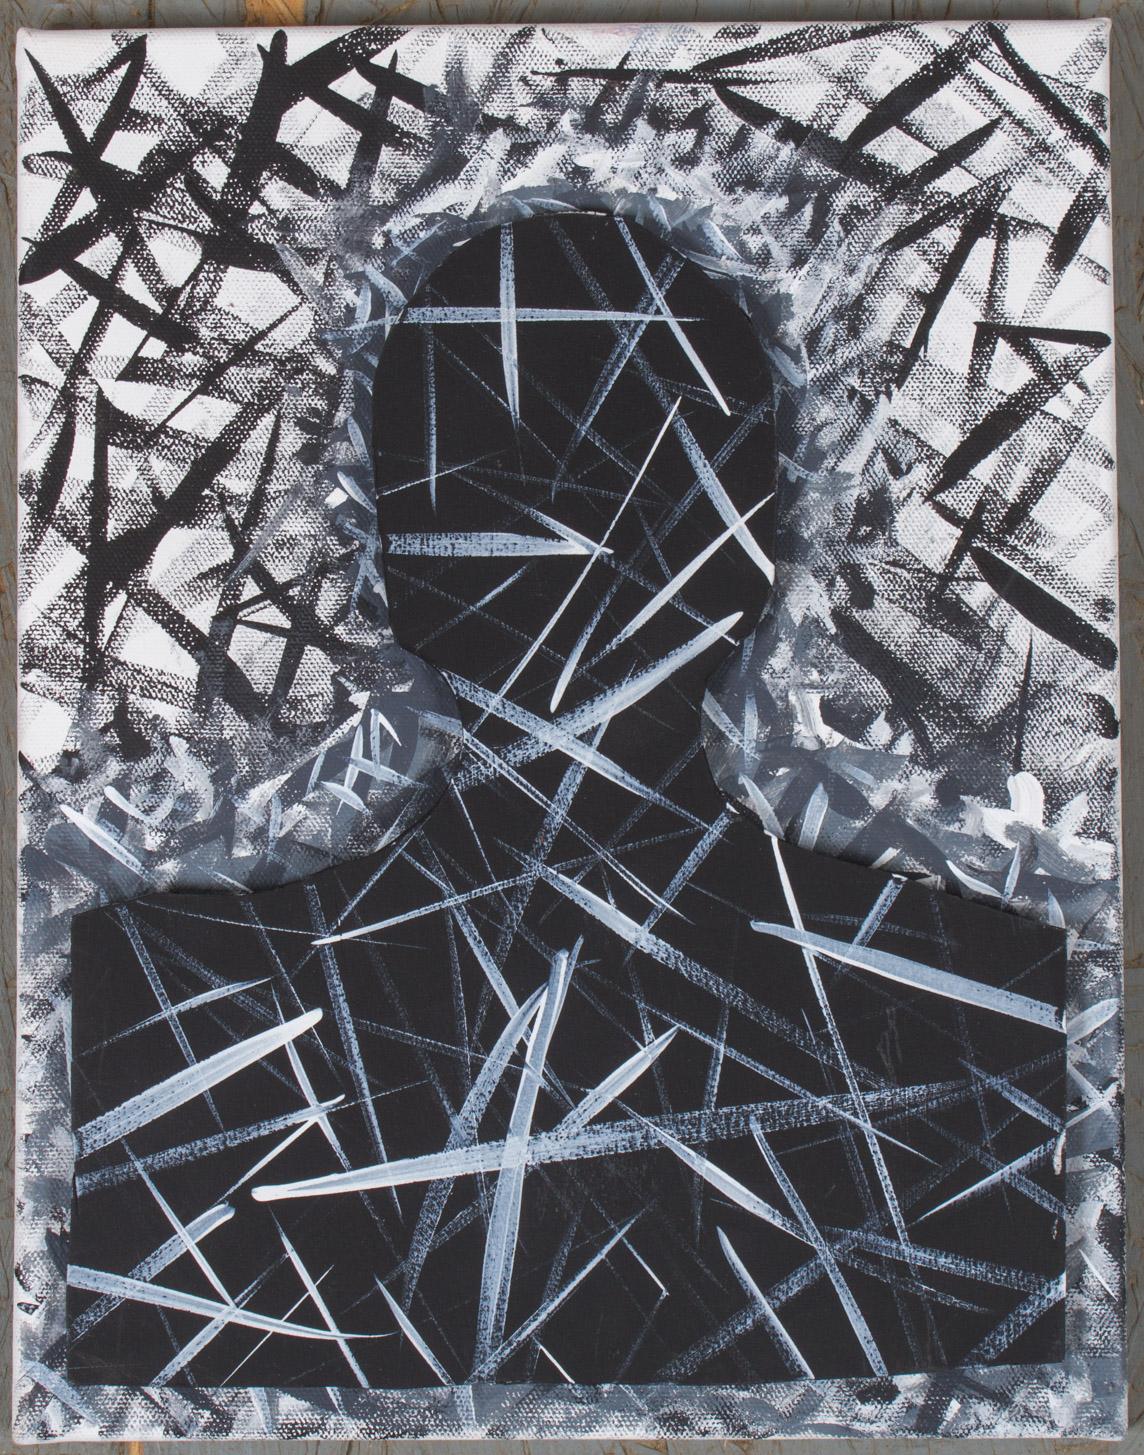 10x14 - canvas board/board - gesso/acrylic